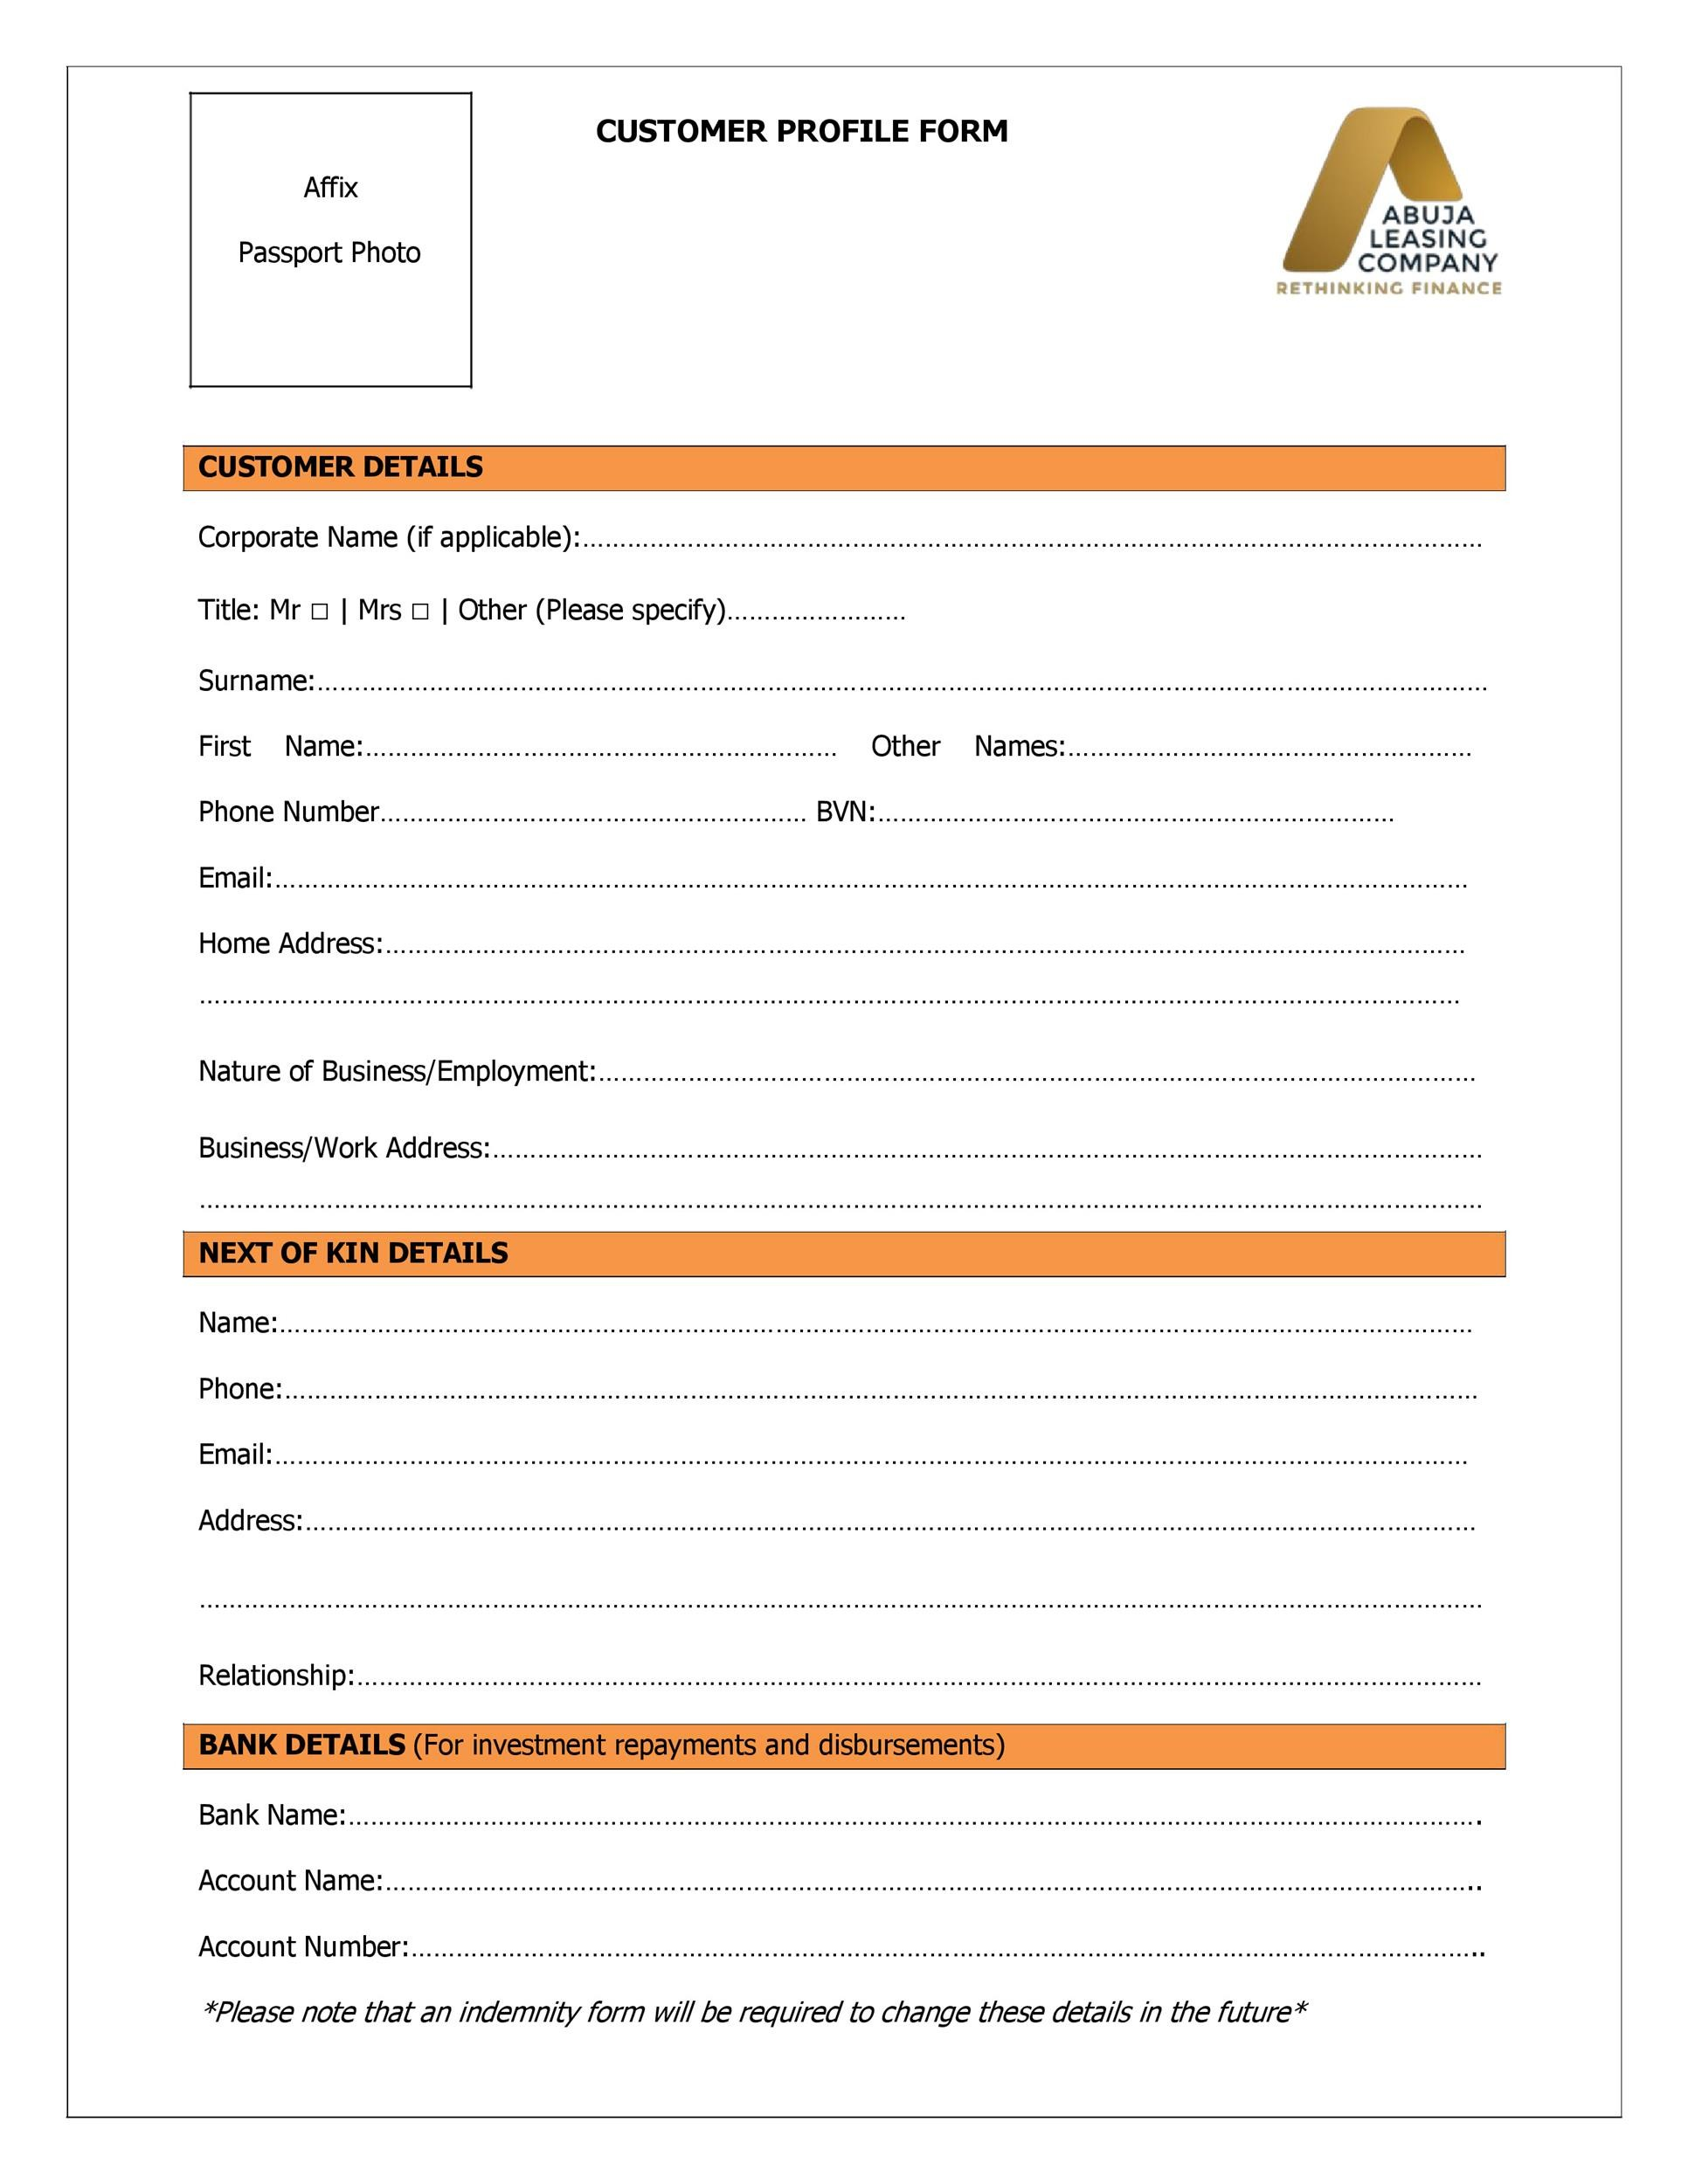 Free customer profile template 47